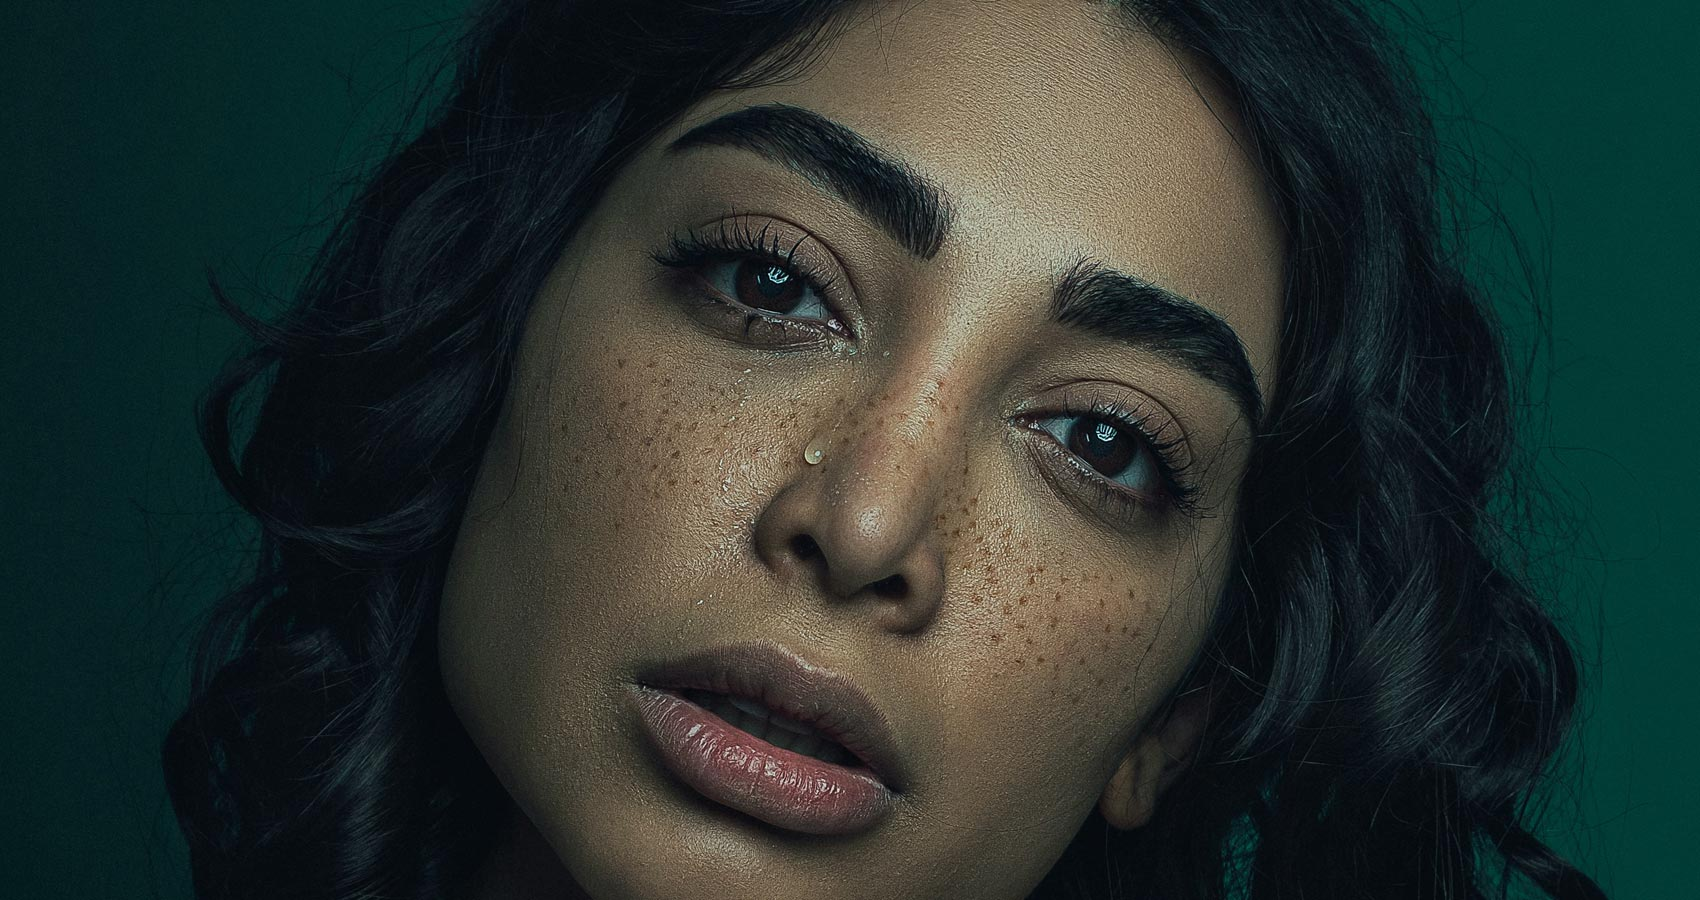 Tears.... Let Them Flow, poetry by Monika Ajay Kaulat Spillwords.com